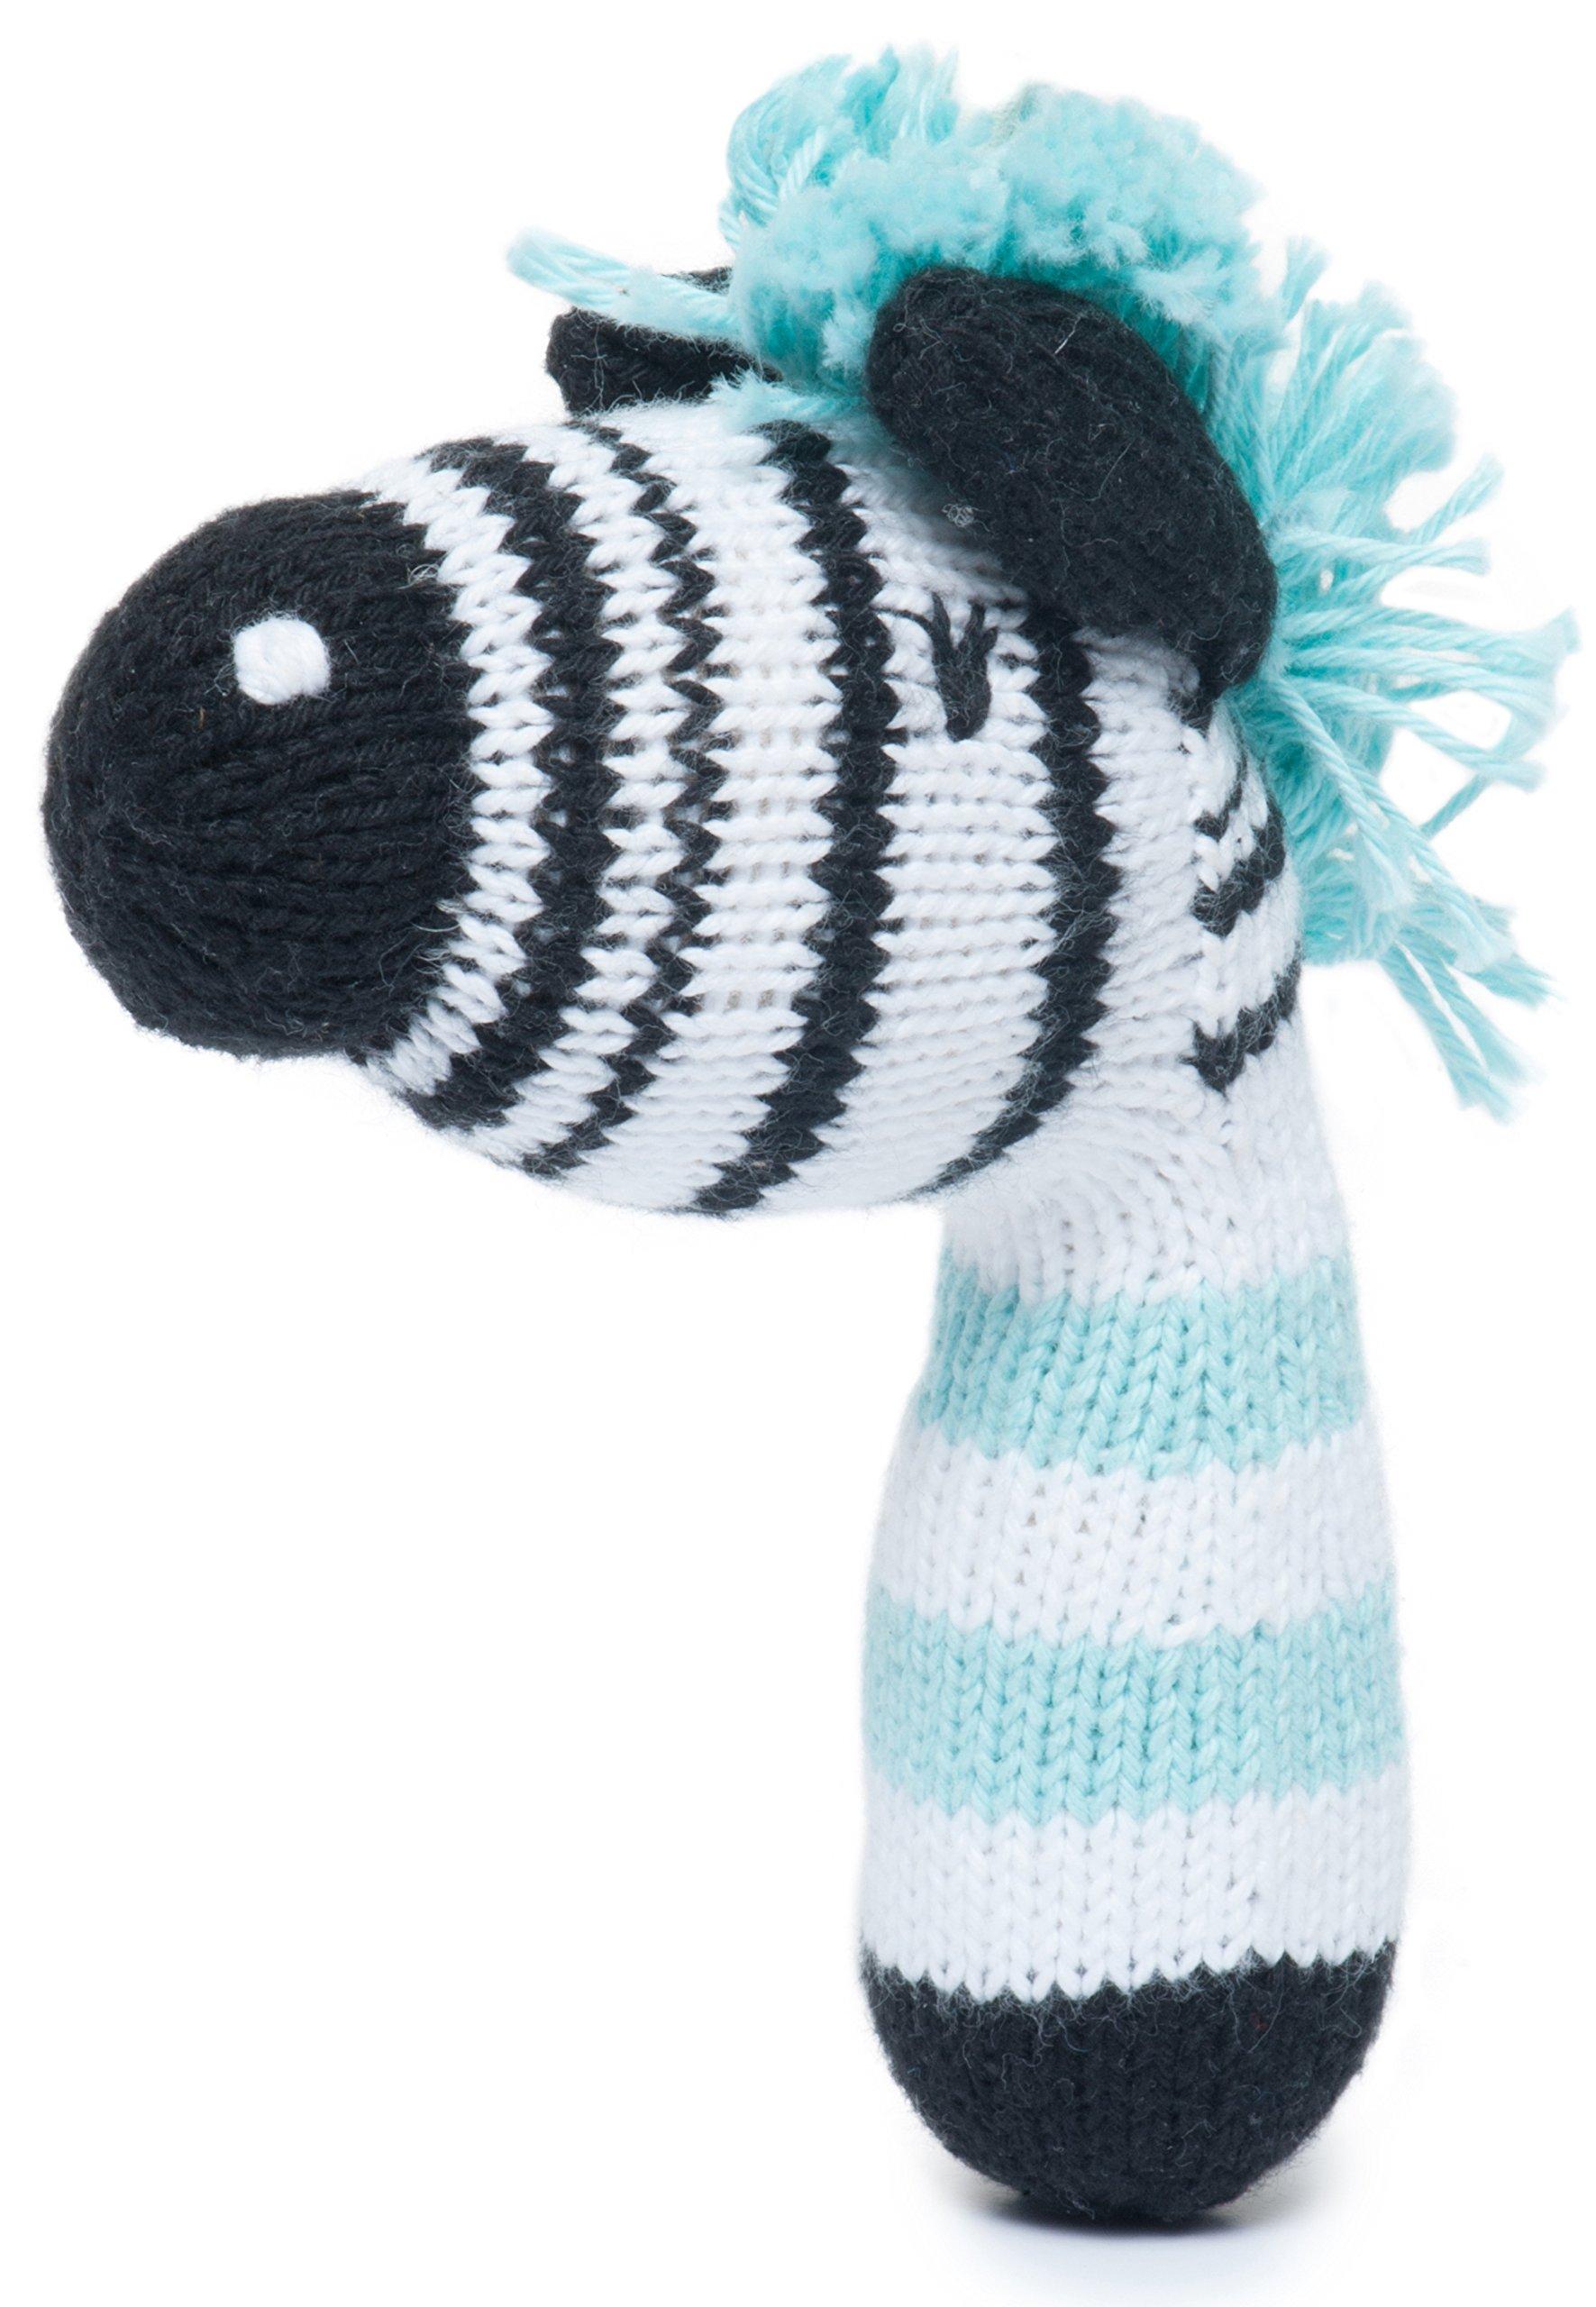 Finn + Emma Mini Rattle Organic Cotton Knit Rattle for Baby Boy Or Girl – Daisy The Zebra